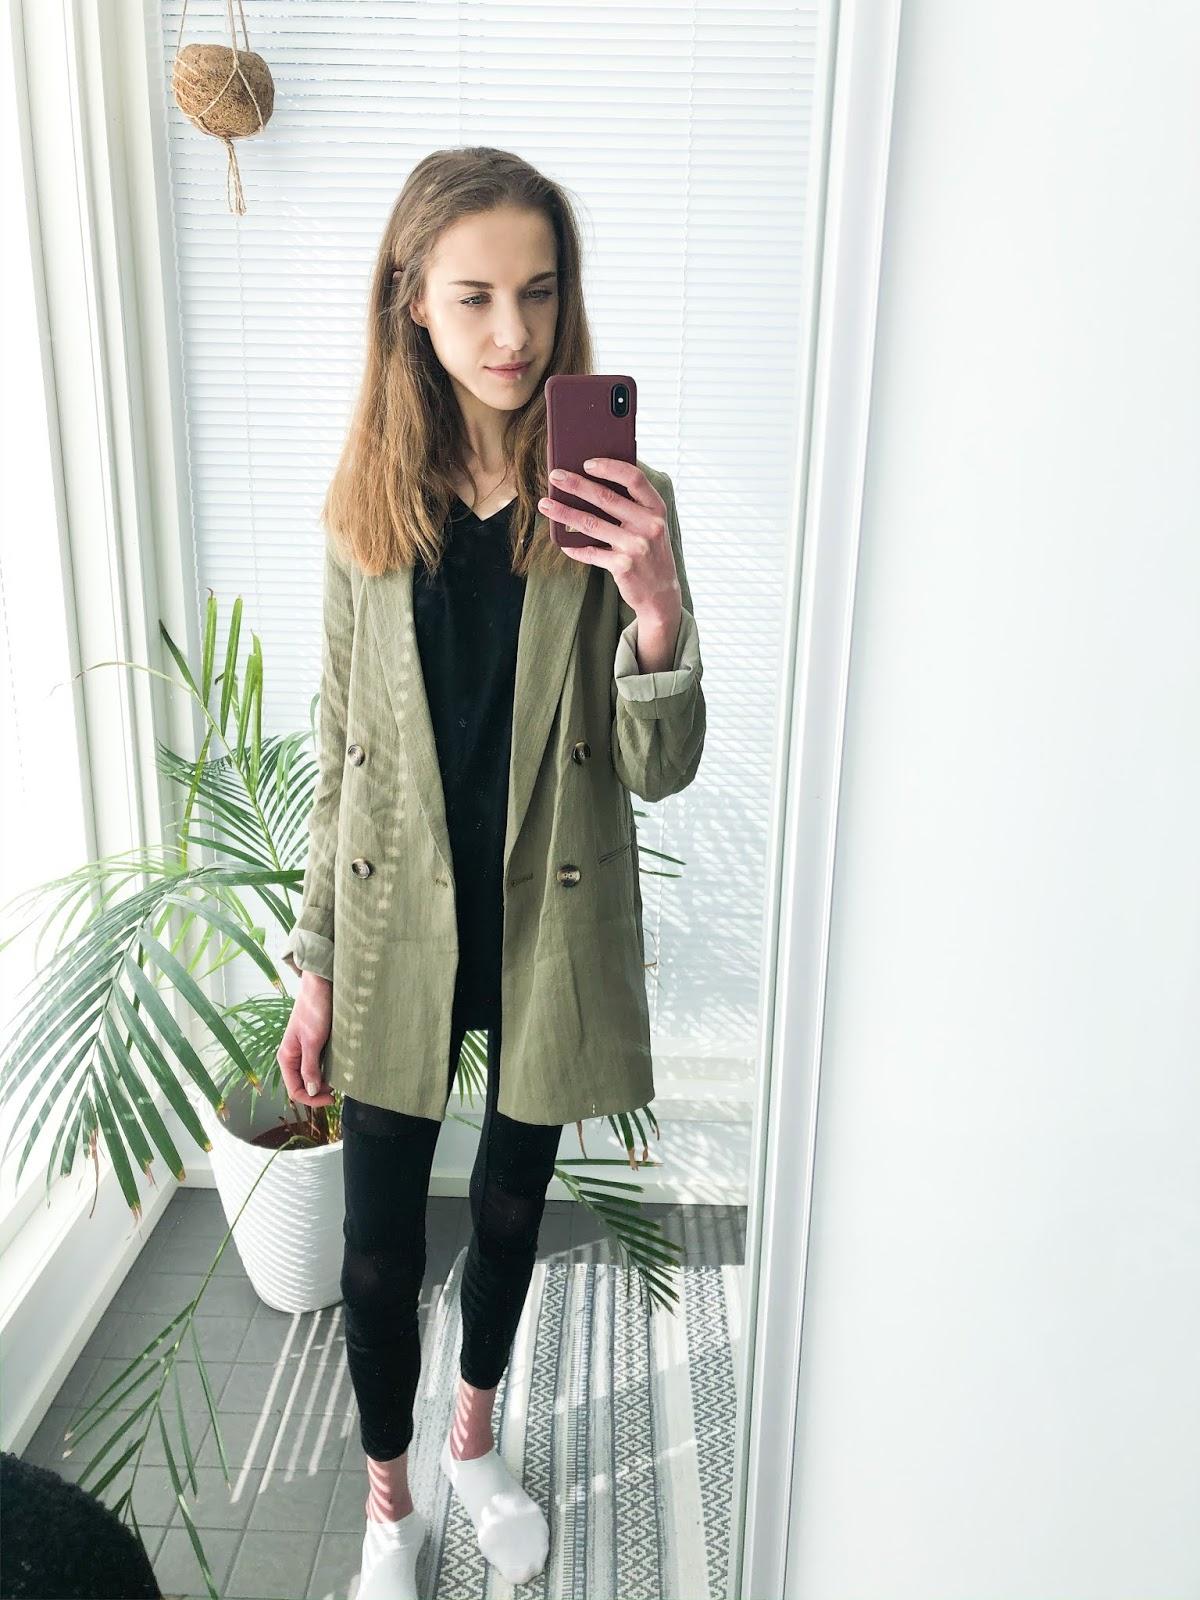 Spring fashion 2020: green blazer - Kevätmuoti 2020: vihreä bleiseri